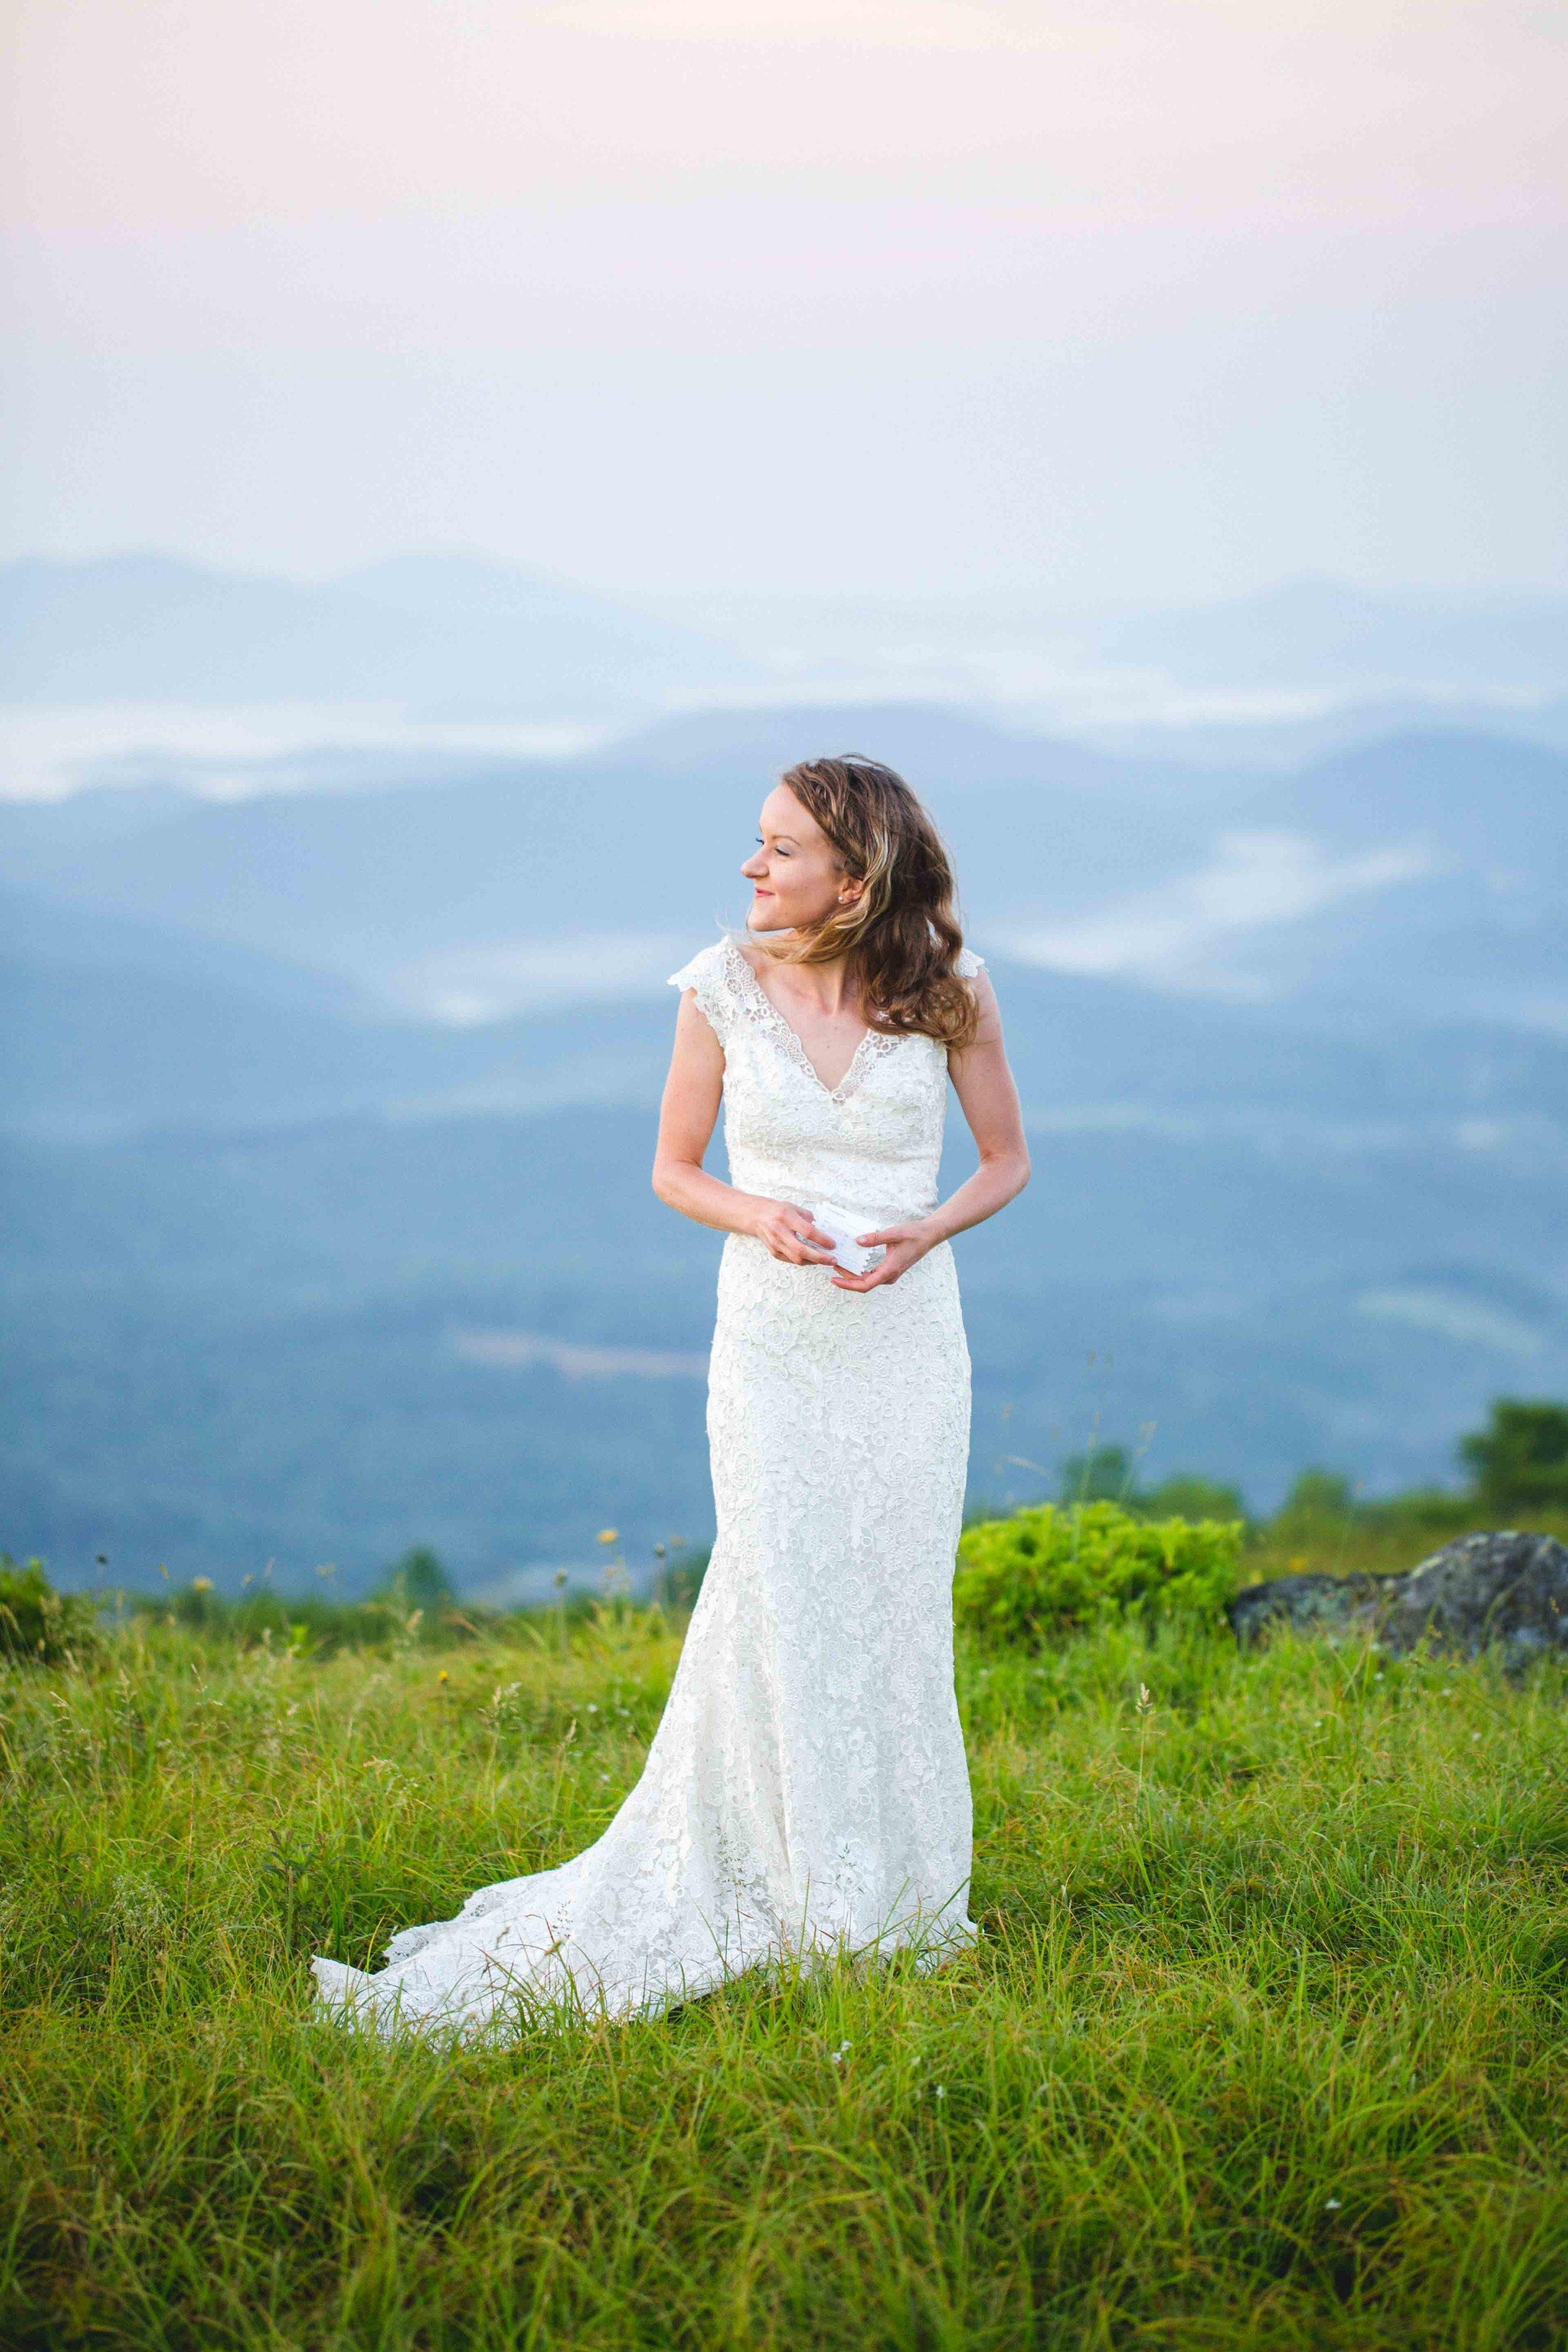 north-carolina-elopement-photographer-18.jpg